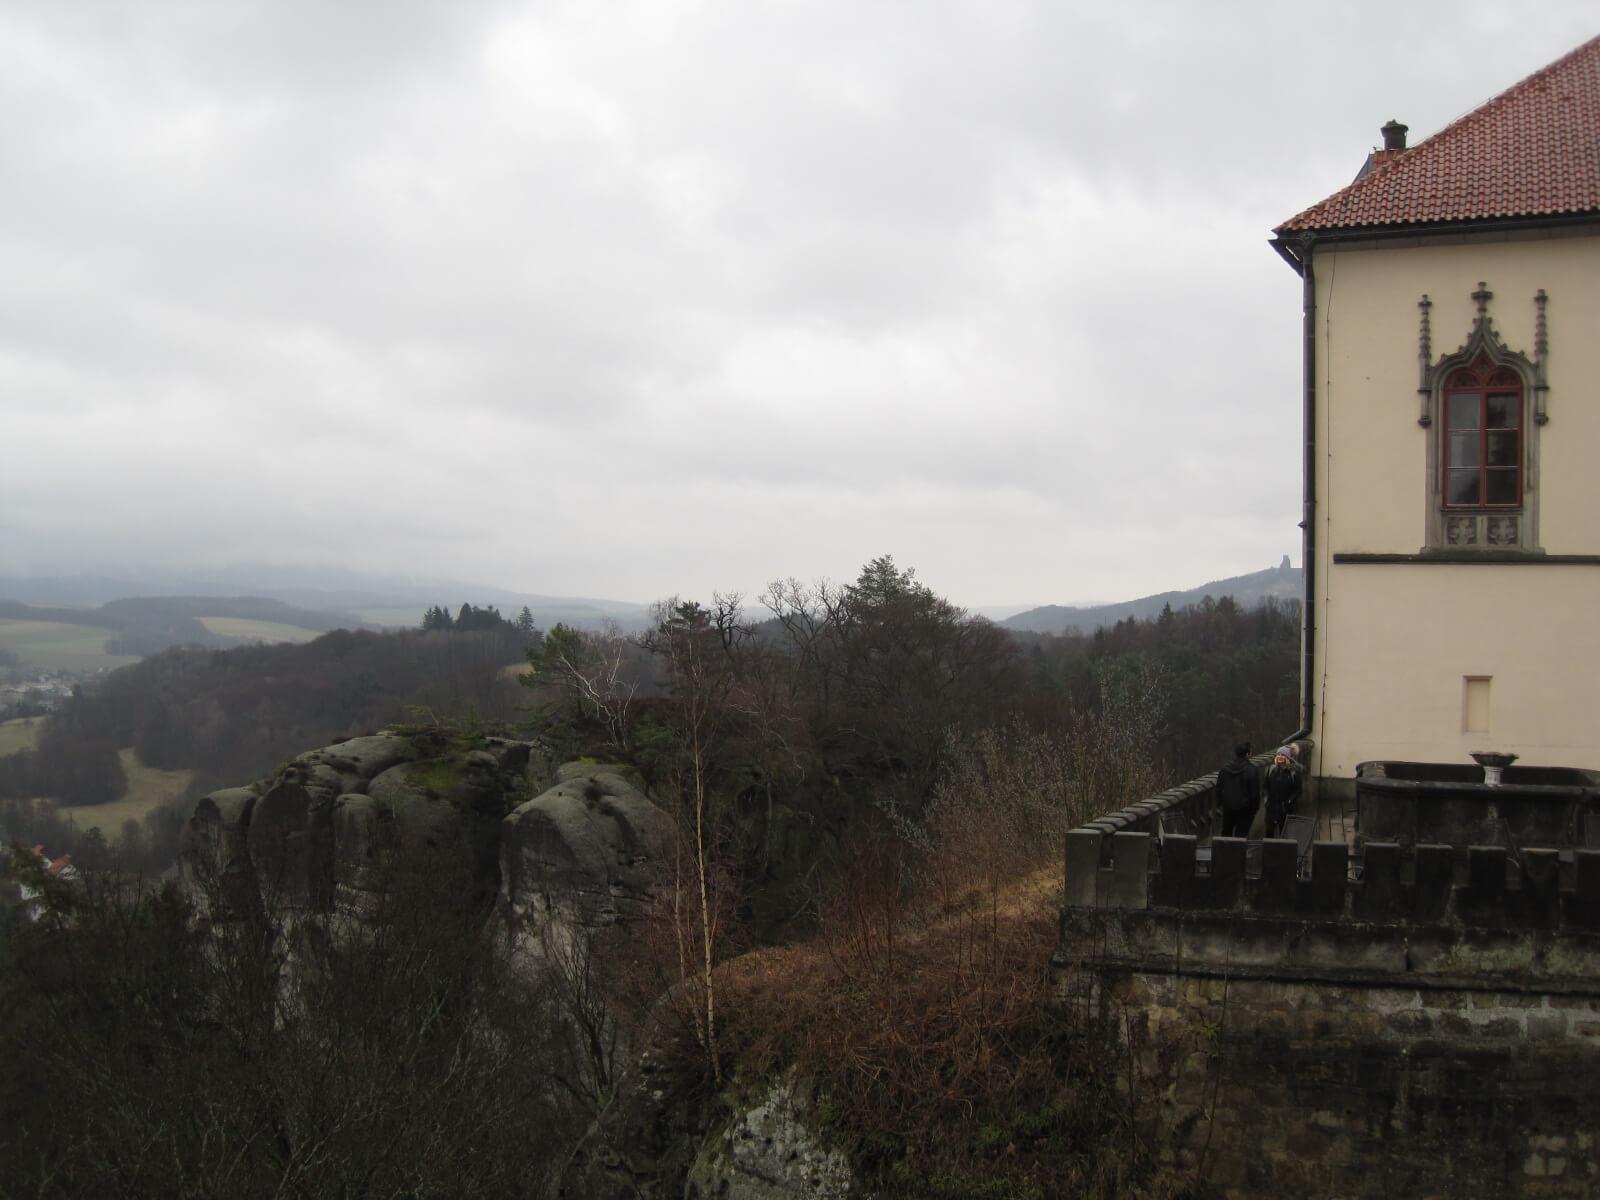 Malá Skála Castle Panorama